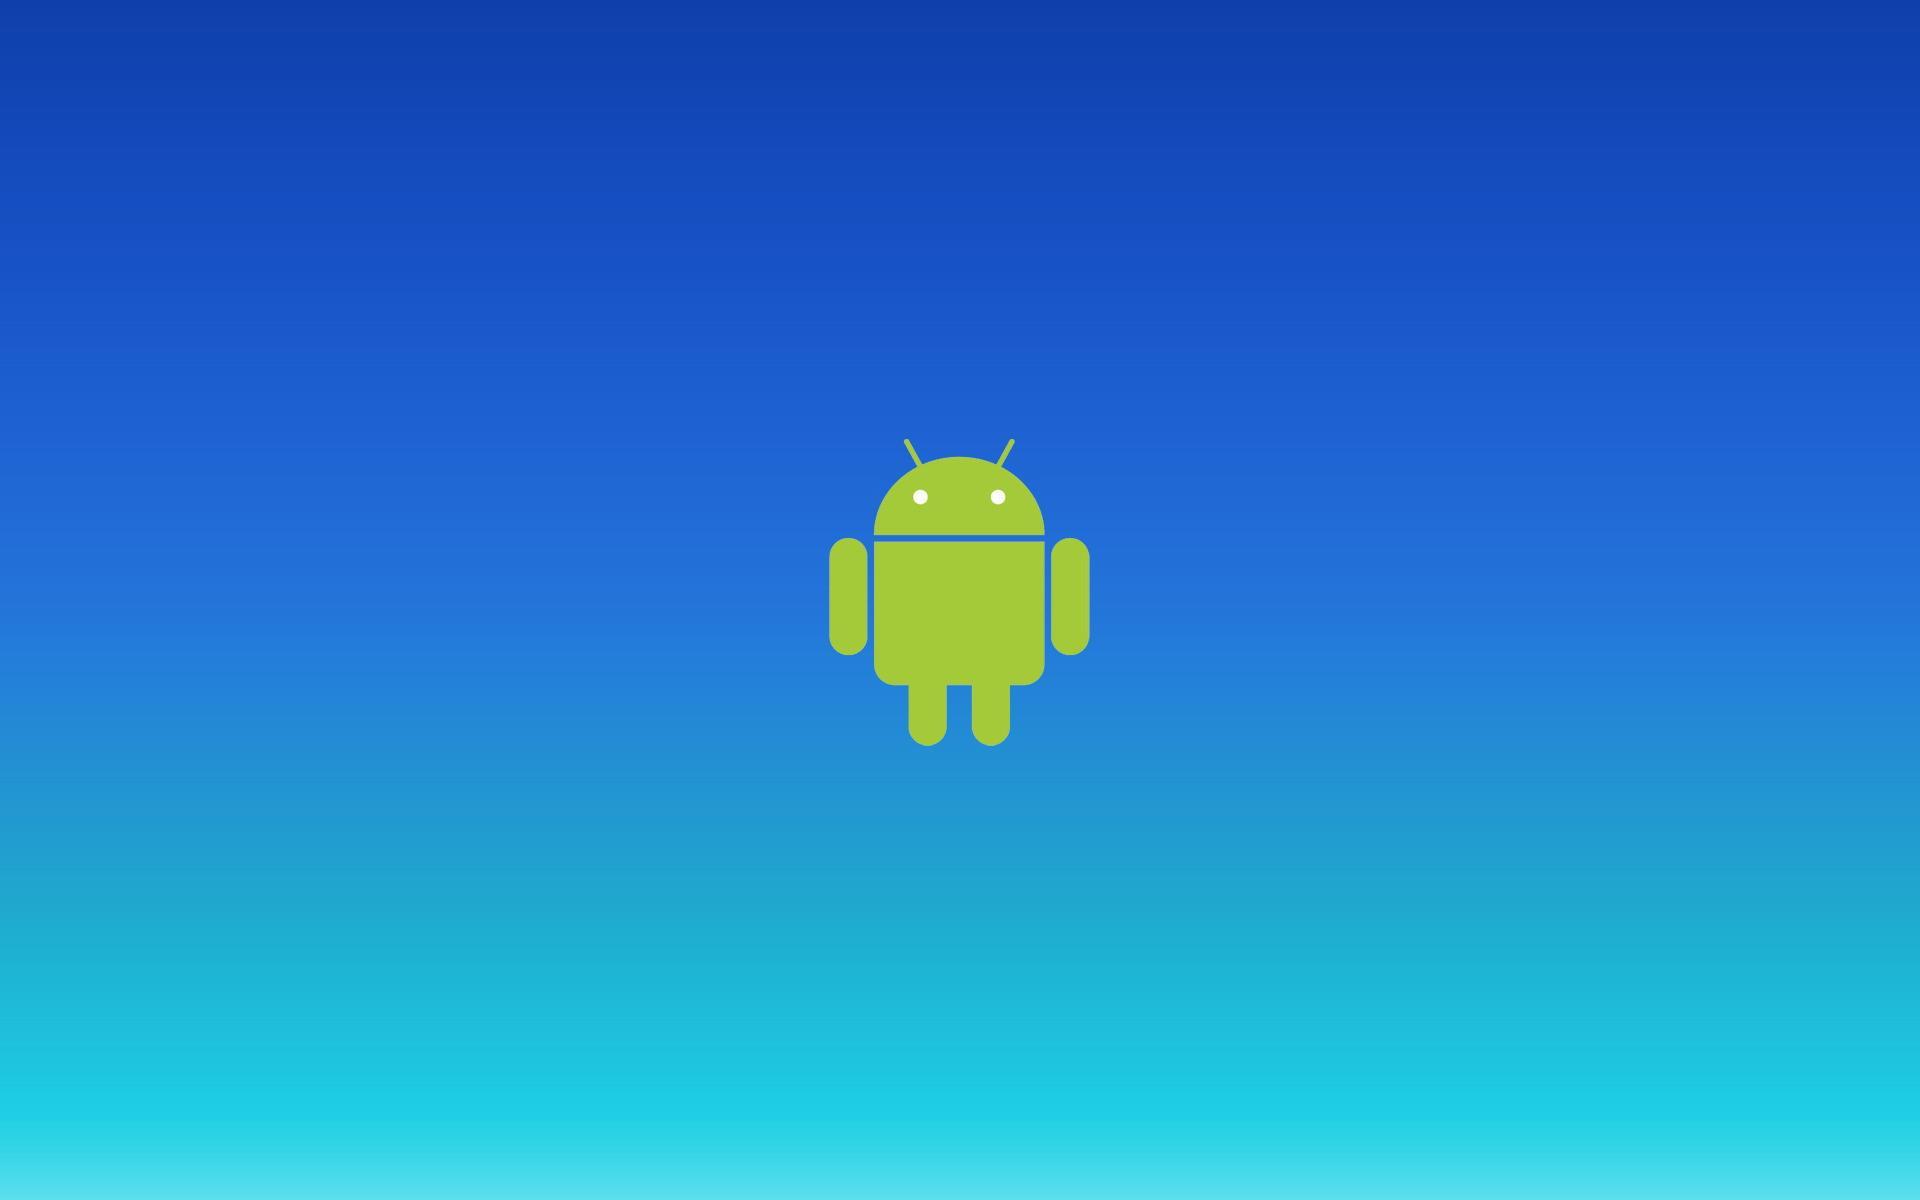 android-logo-windows-10-fonds-ecran-telecharger_1